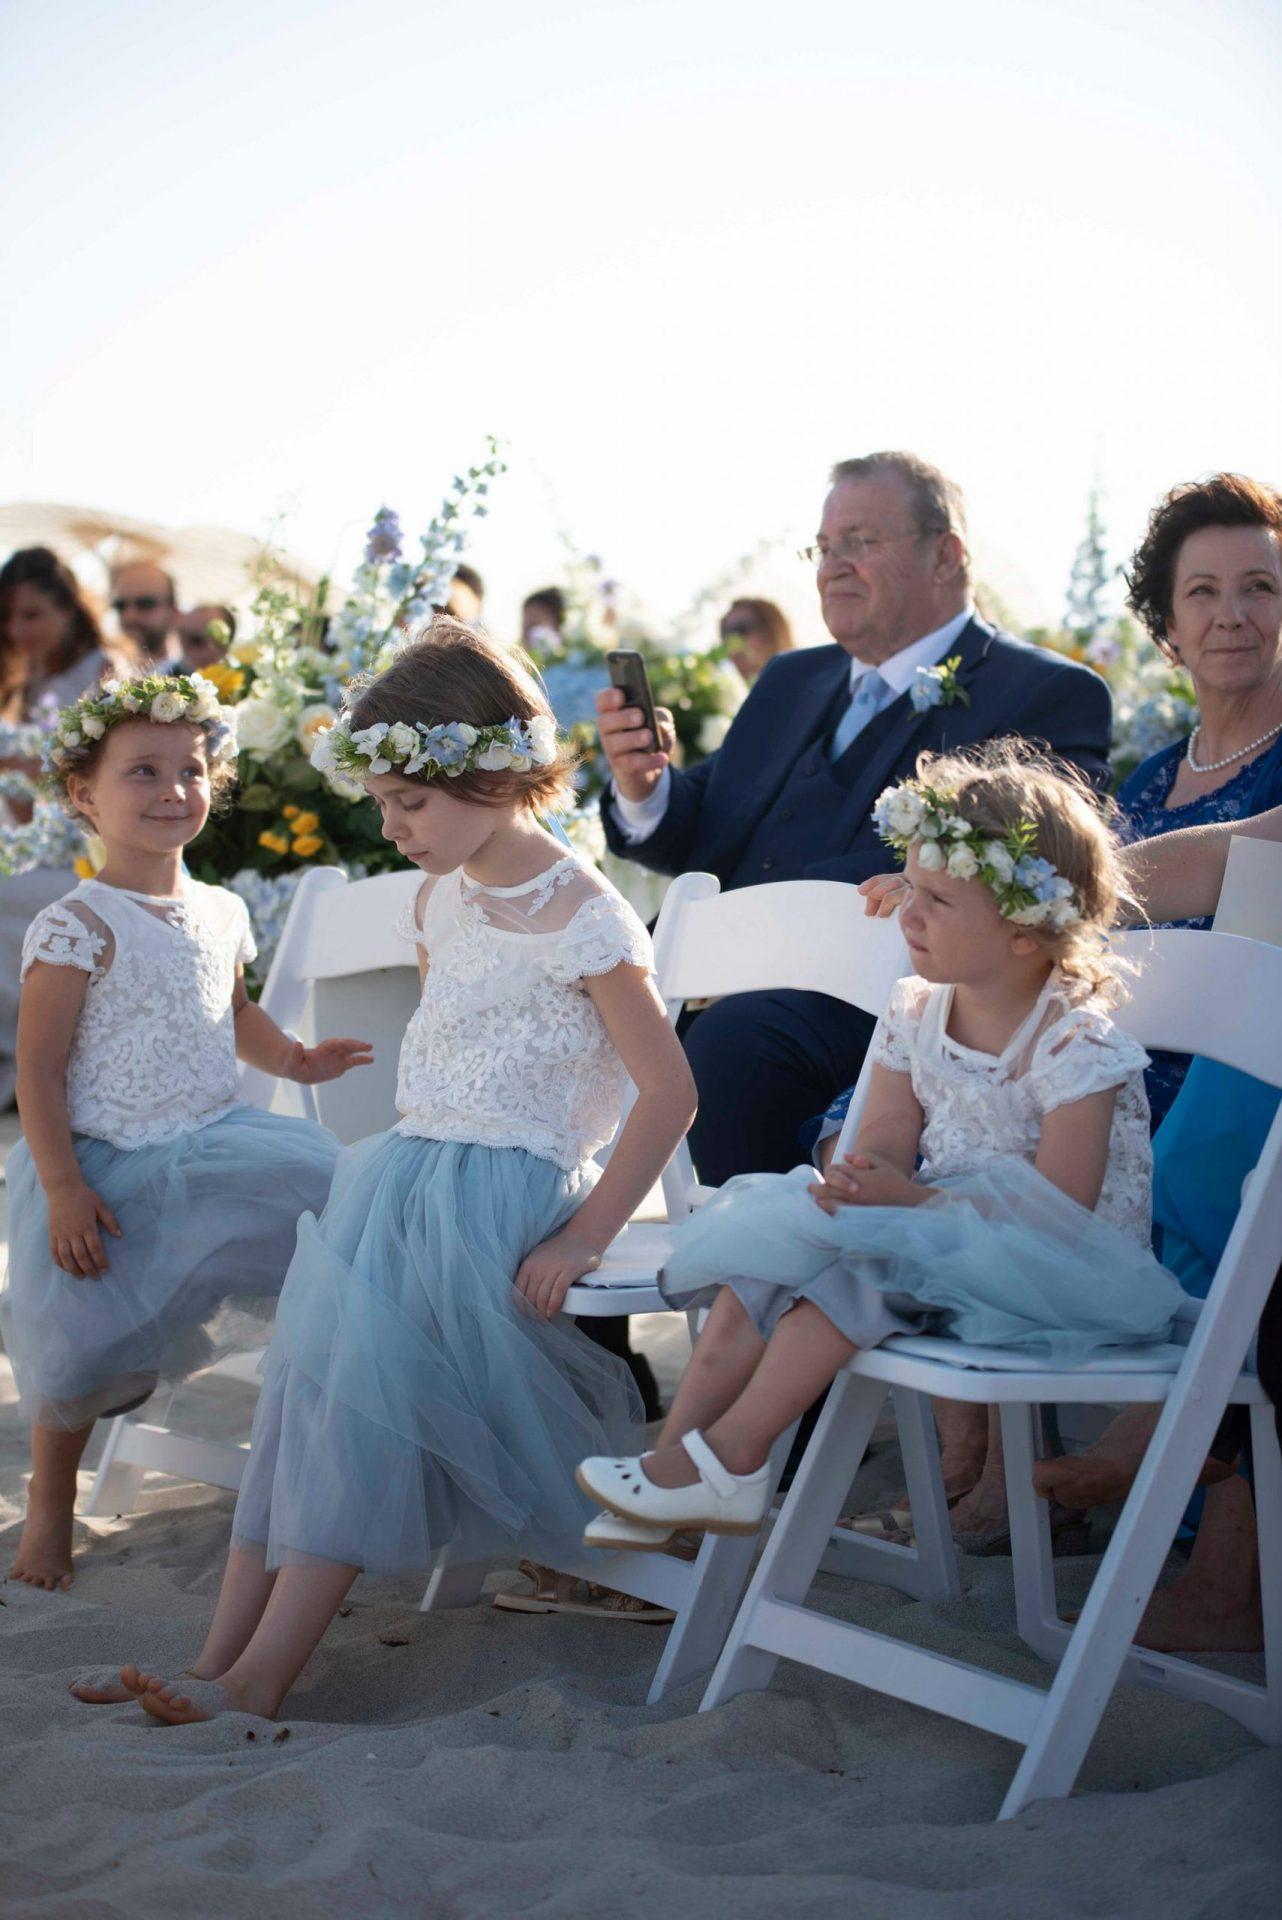 Linda and Enrico, flower girls